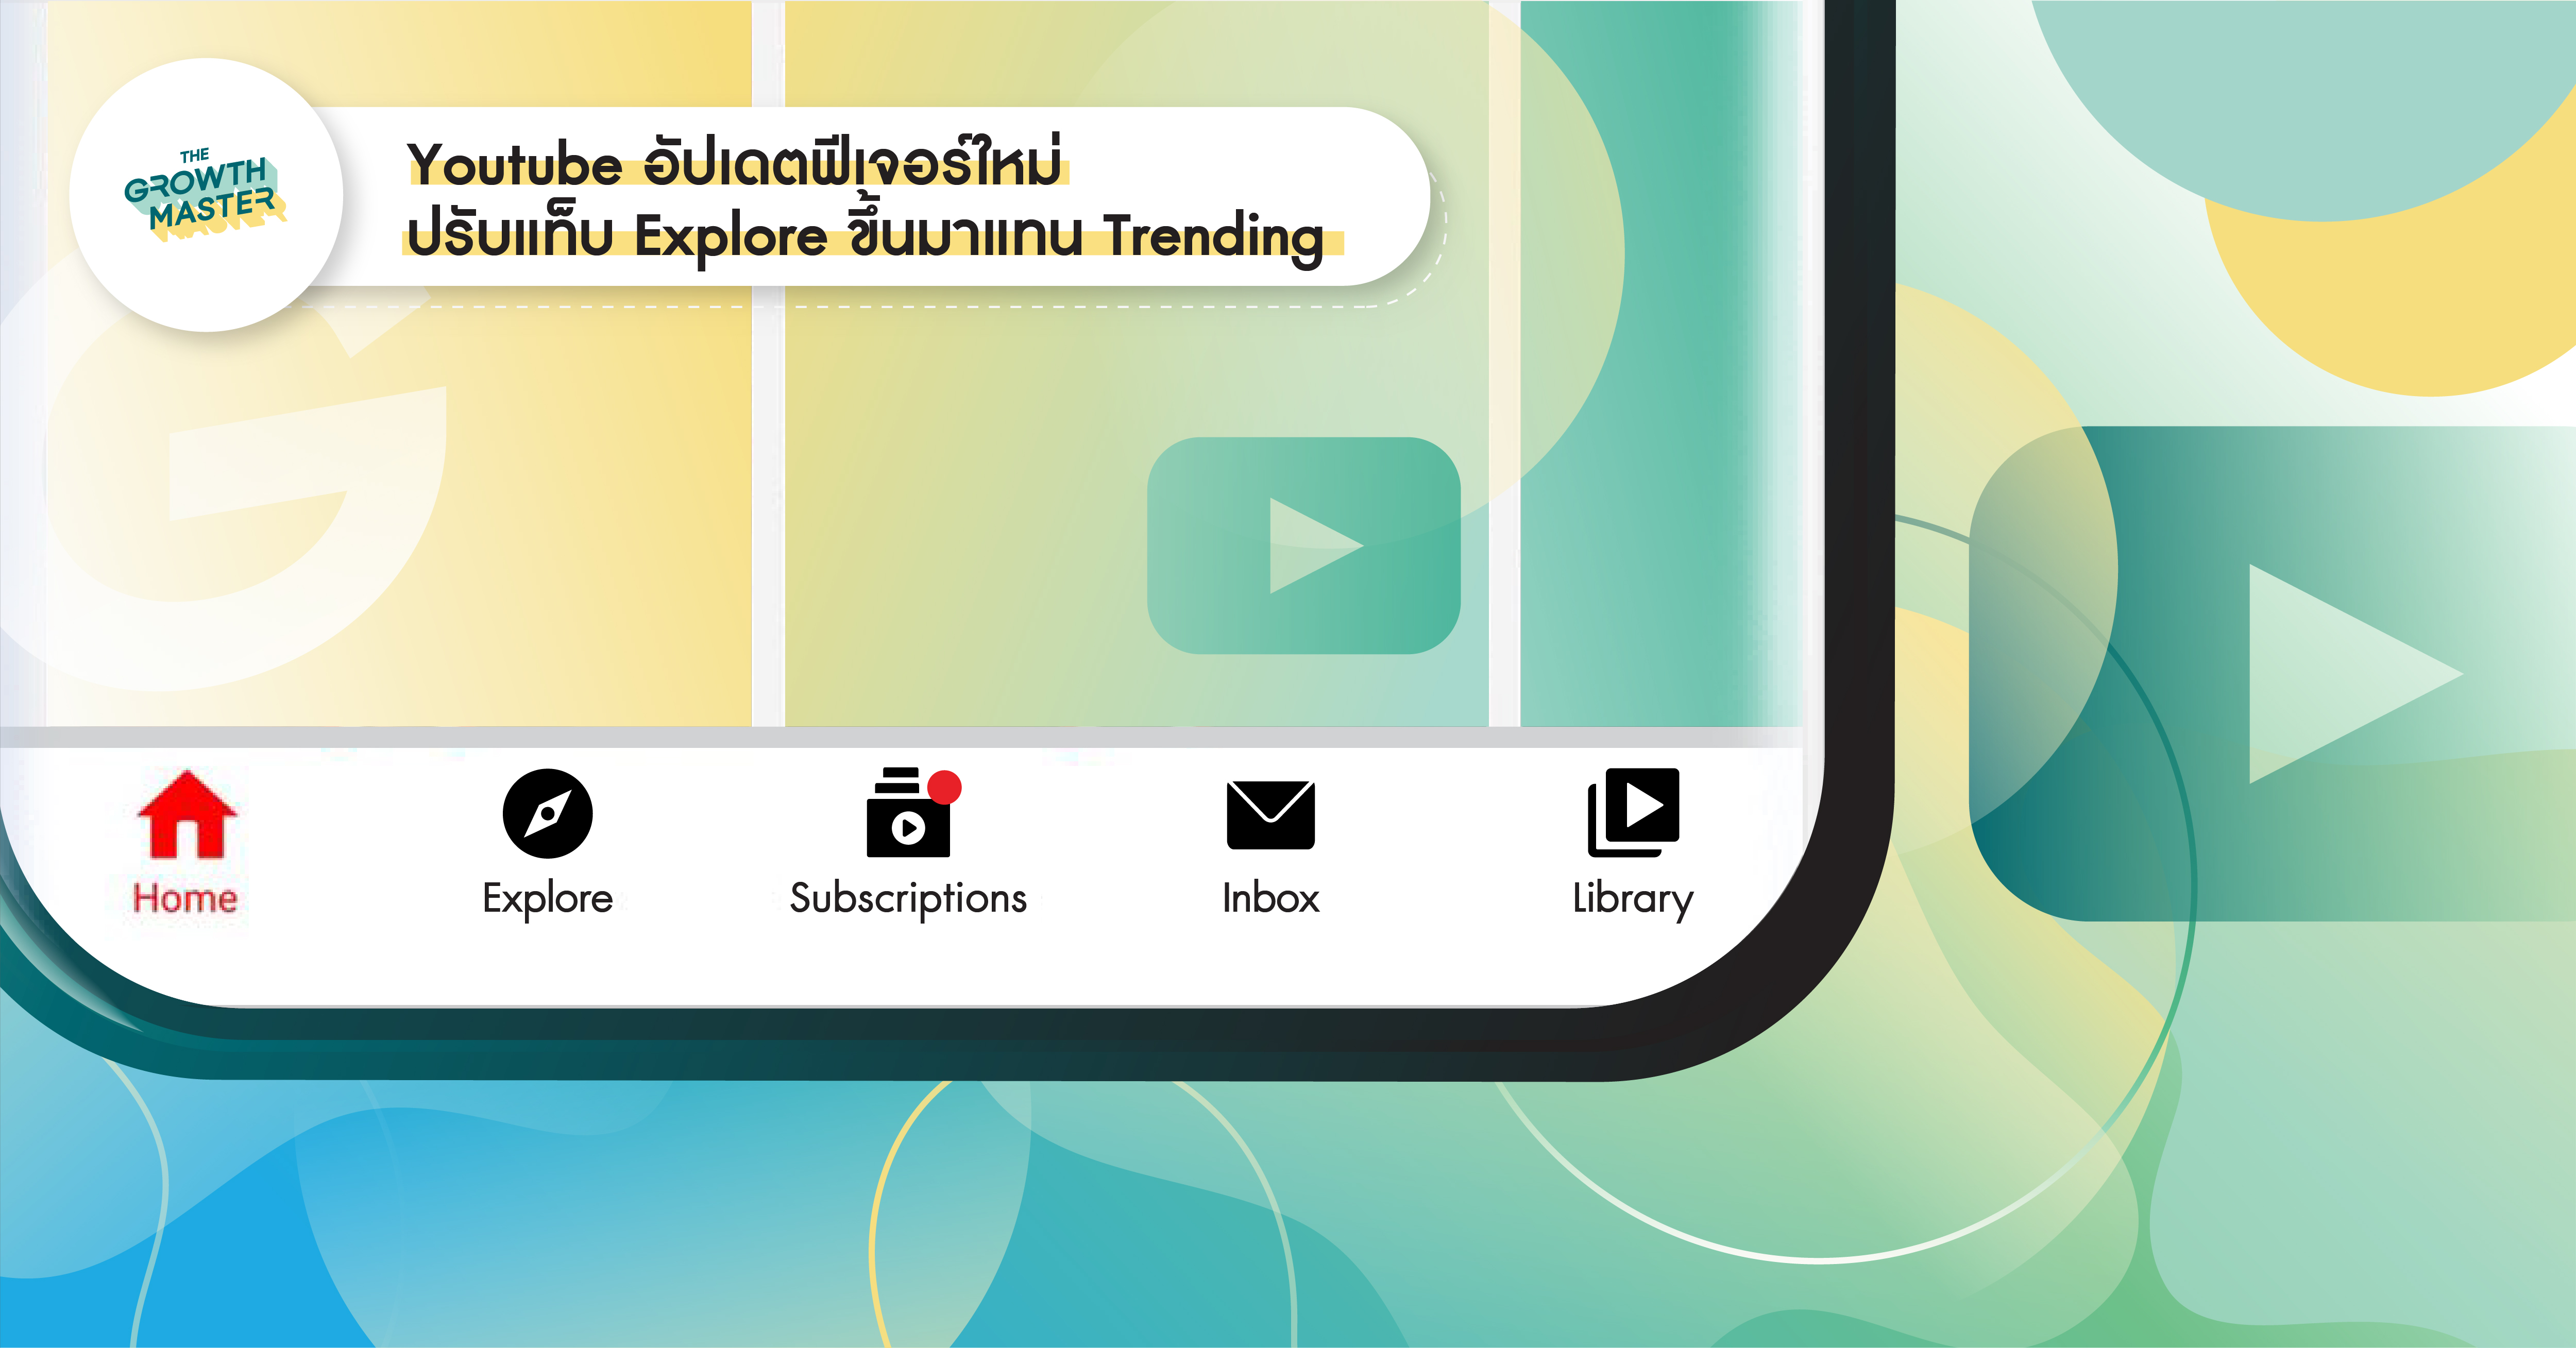 Youtube อัปเดตหน้าตาใหม่ ปรับแท็บ Explore ขึ้นมาแทน Trending